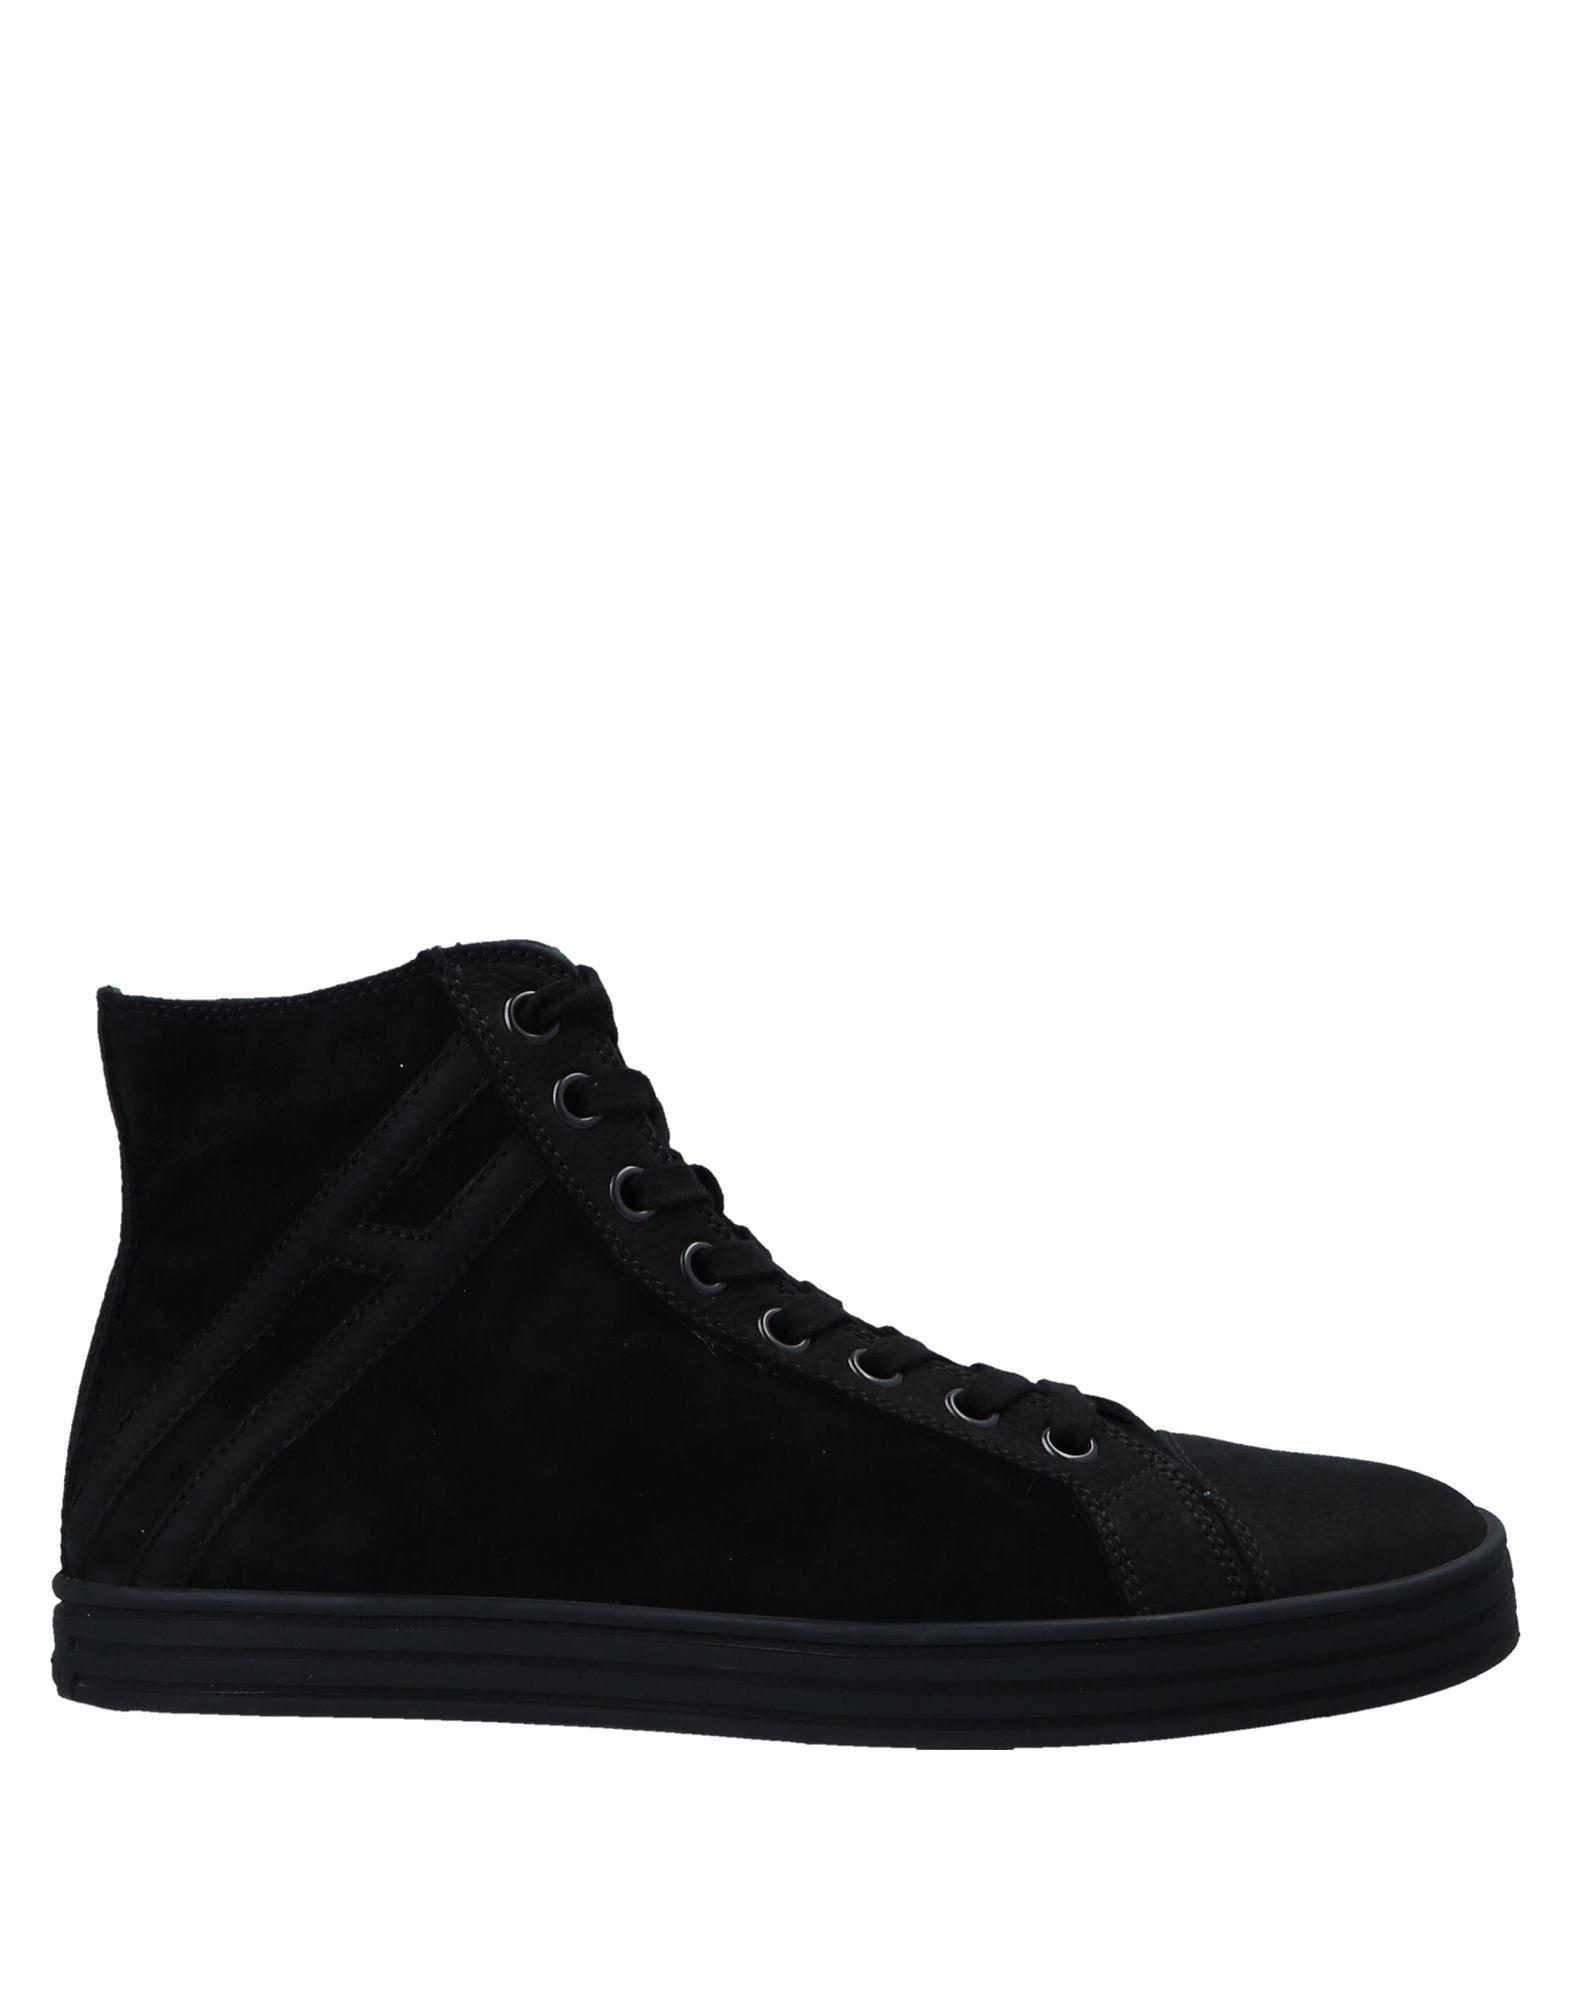 Hogan Sneakers Herren  11561456VP Gute Qualität beliebte Schuhe